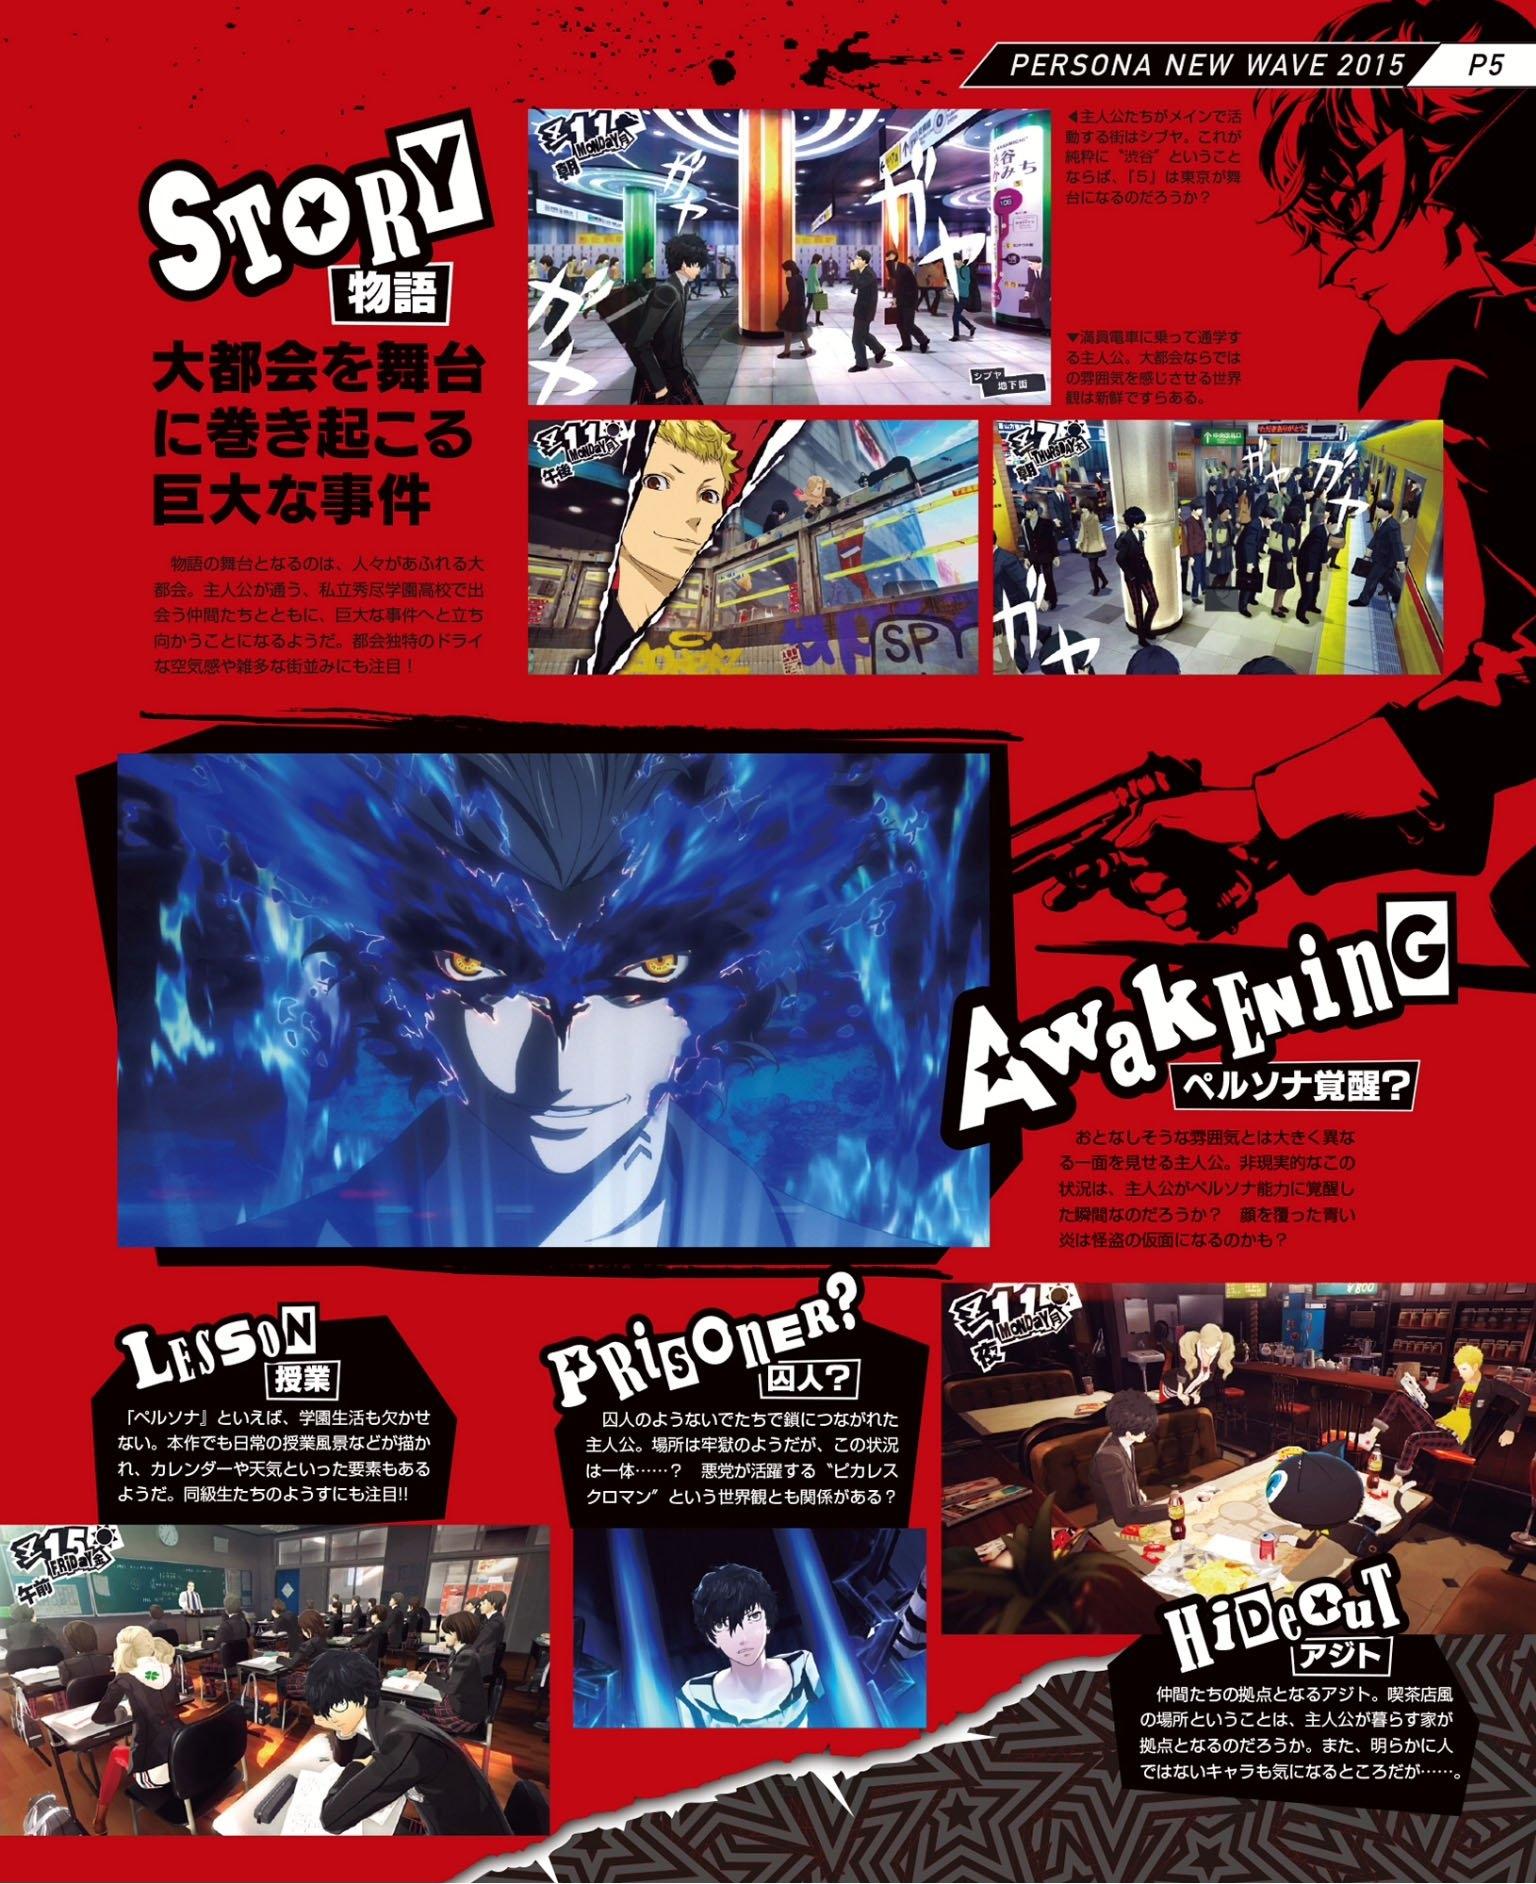 Dengeki Playstation Shares More Persona 5 Details, Full Scans – Gematsu Persona 5 Calendar 2019